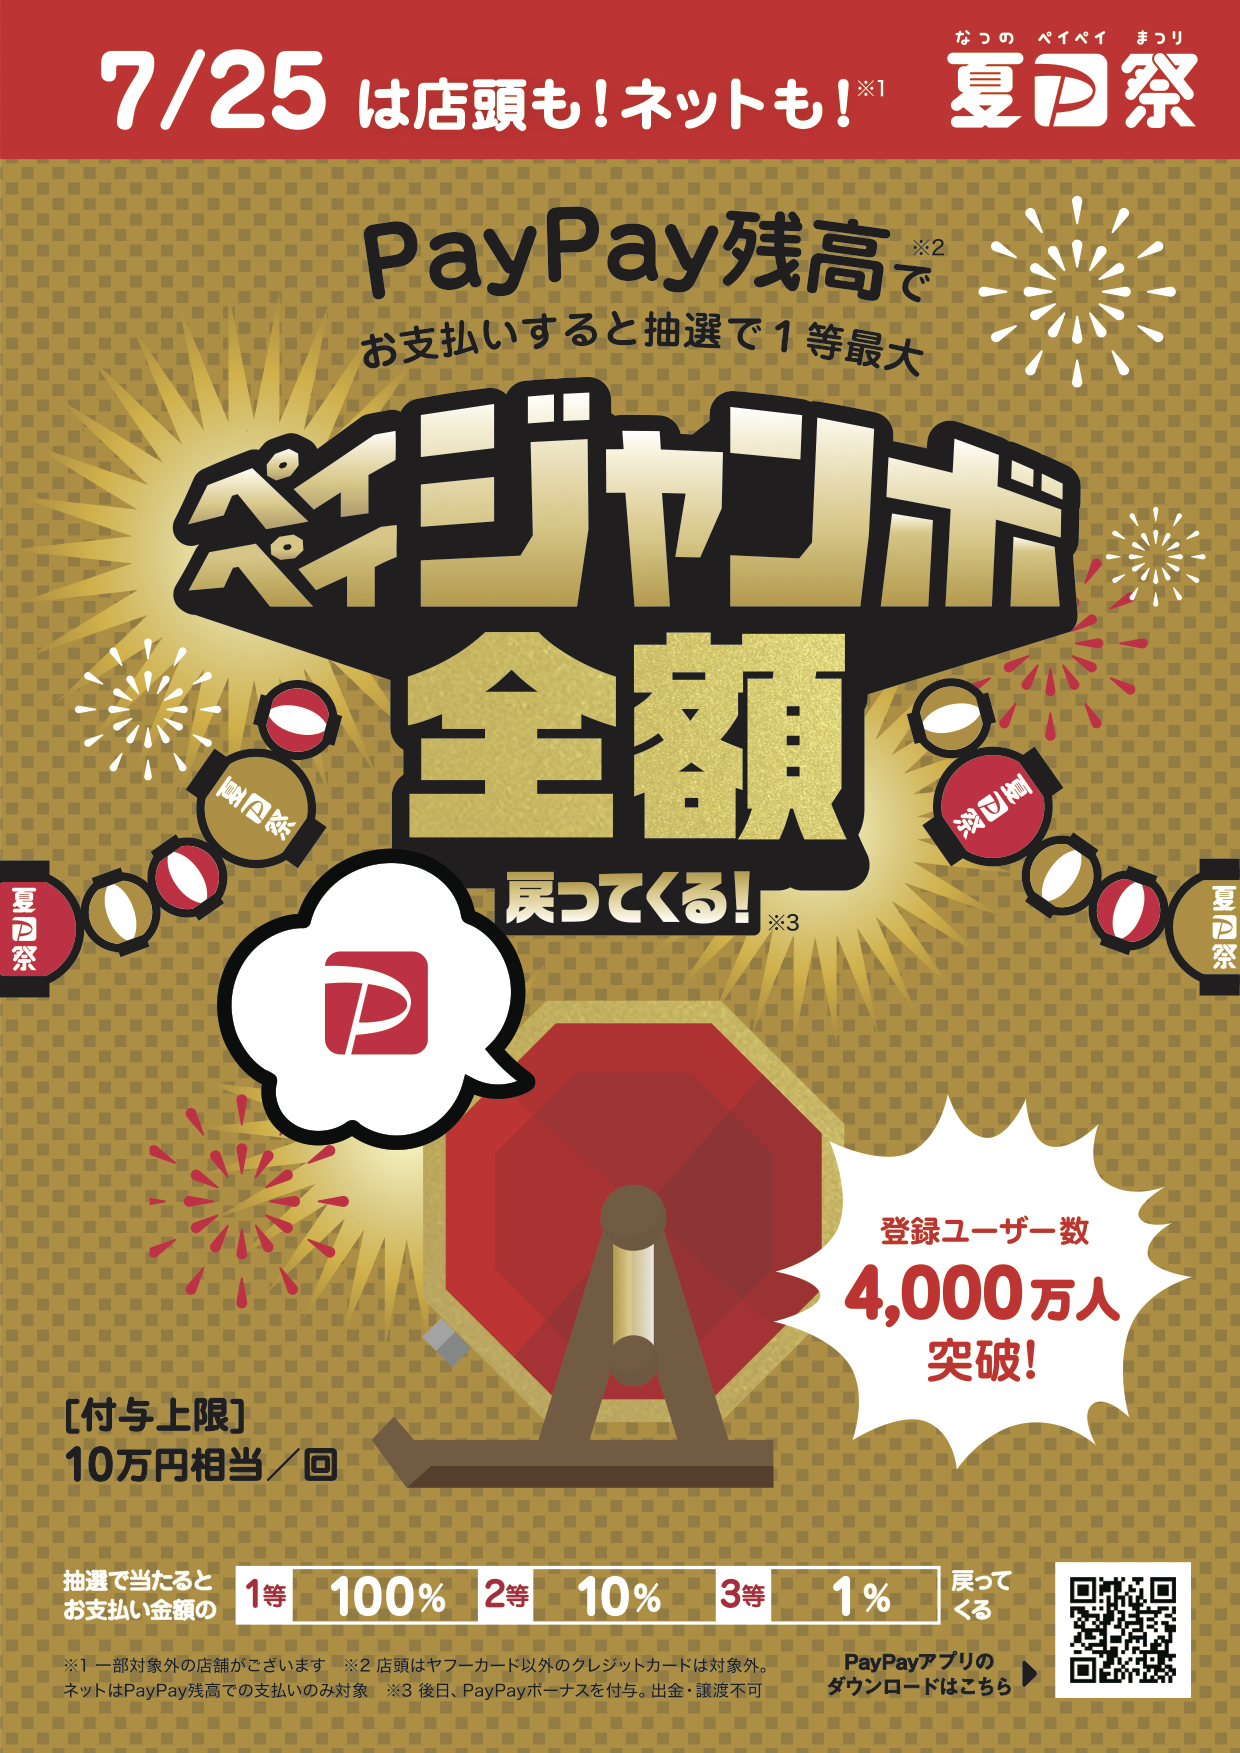 paypaymatsuri-202107-finale-poster-nontalent.jpg